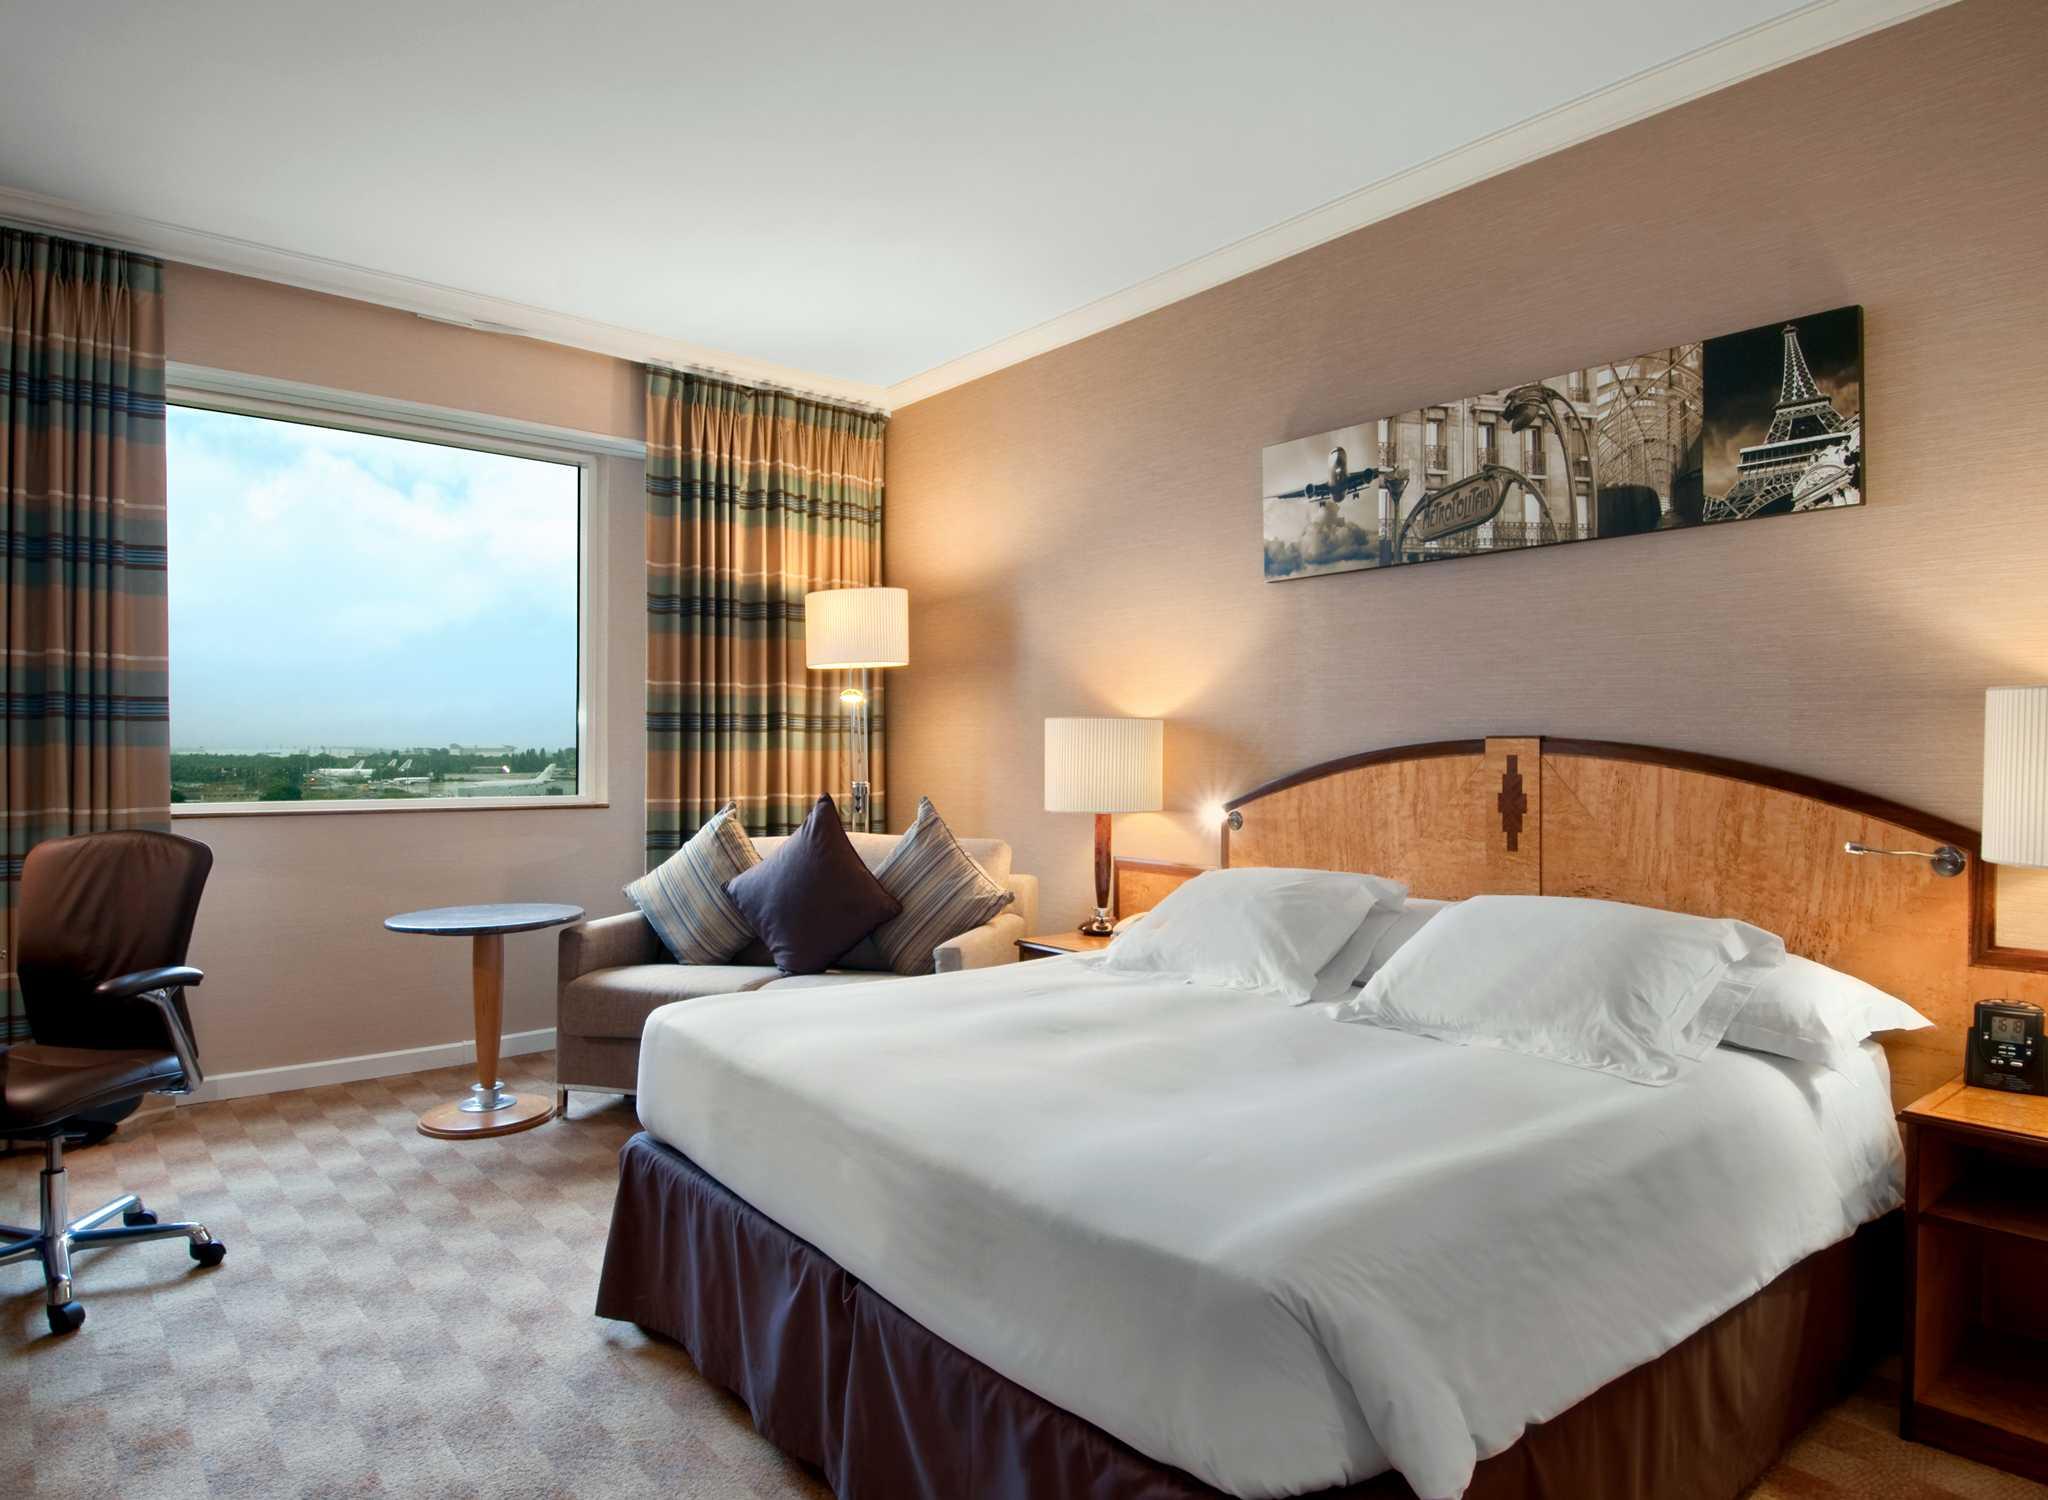 Roissy Hotels – Hilton Paris Charles de Gaulle Airport Hotel ...